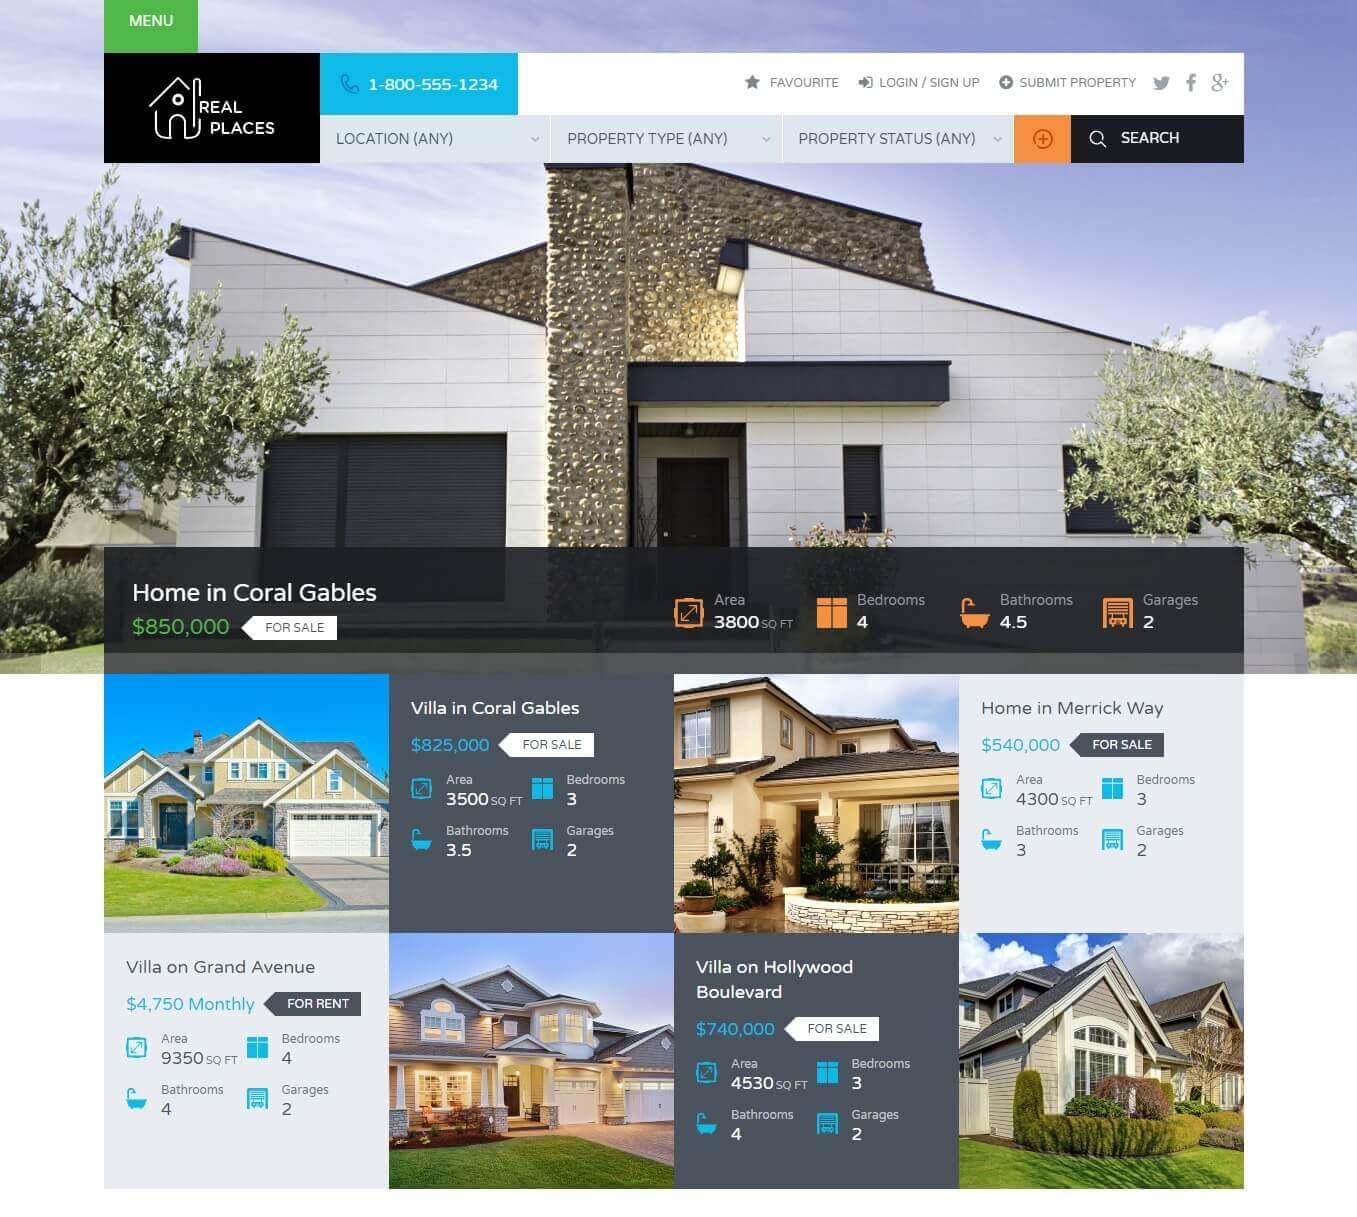 20 Beautiful and Responsive Real Estate WordPress Themes for Agencies, Realtors 2019